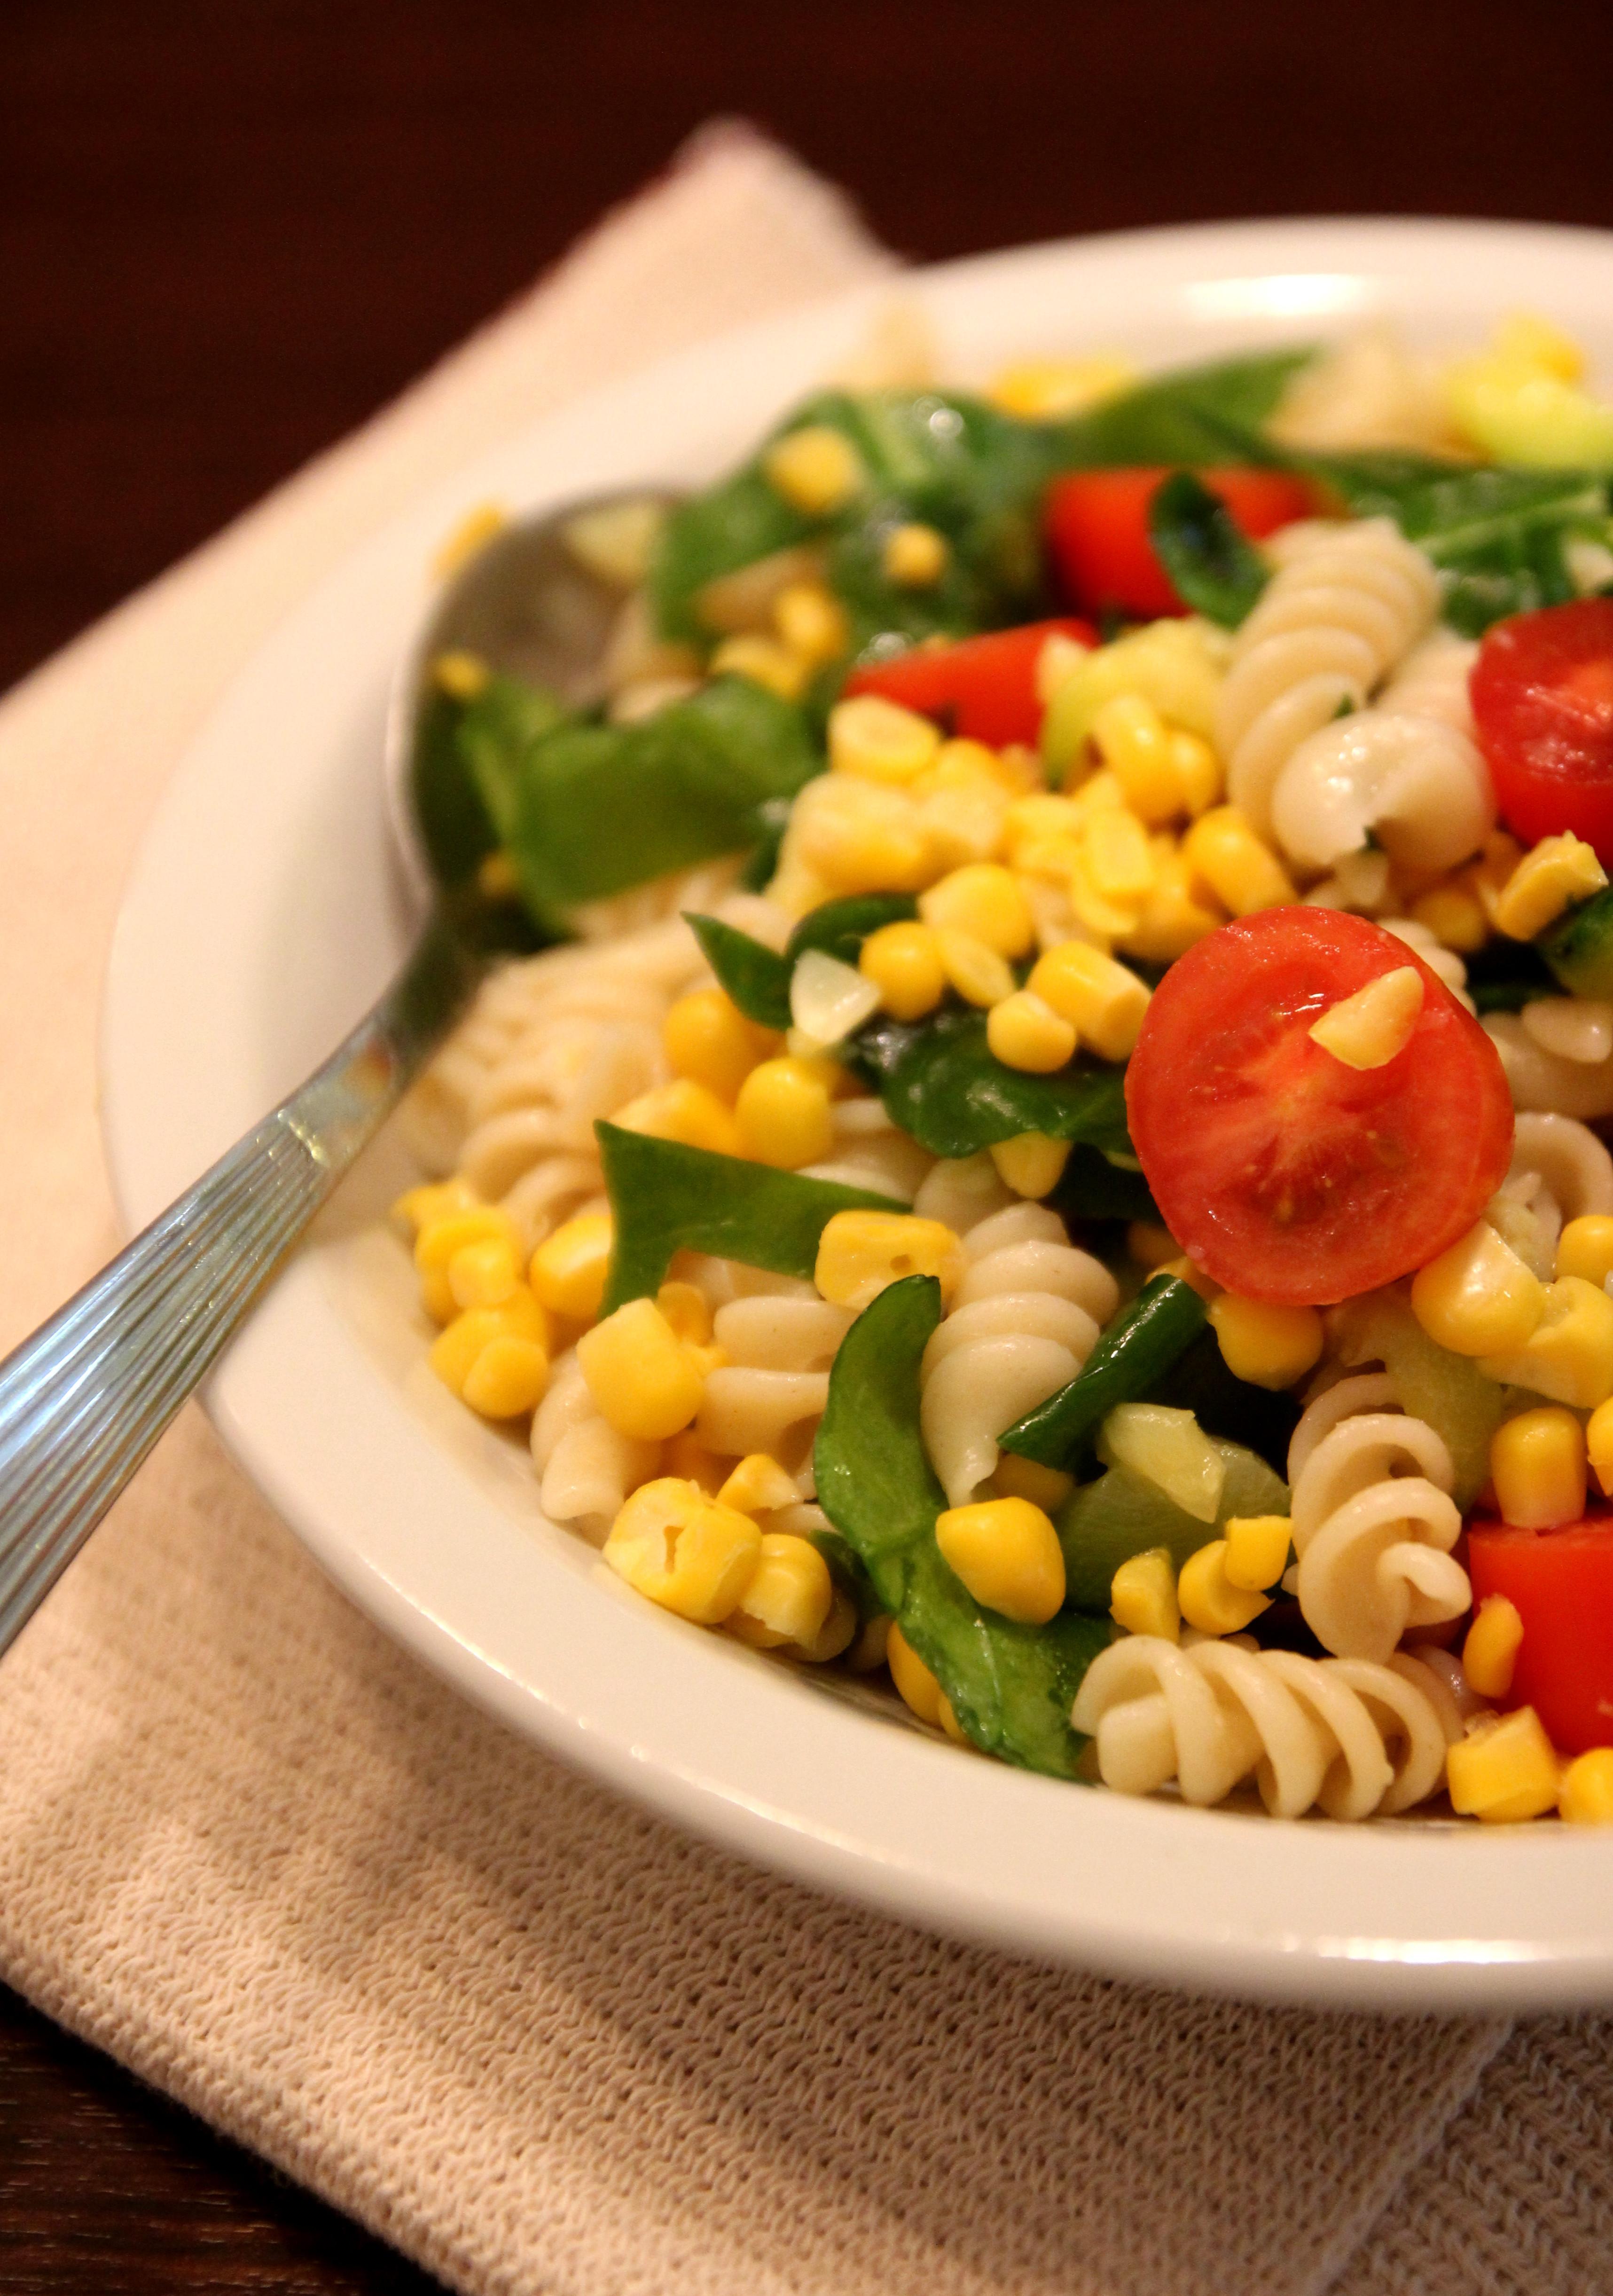 Colorful Vegetable Pasta Salad15